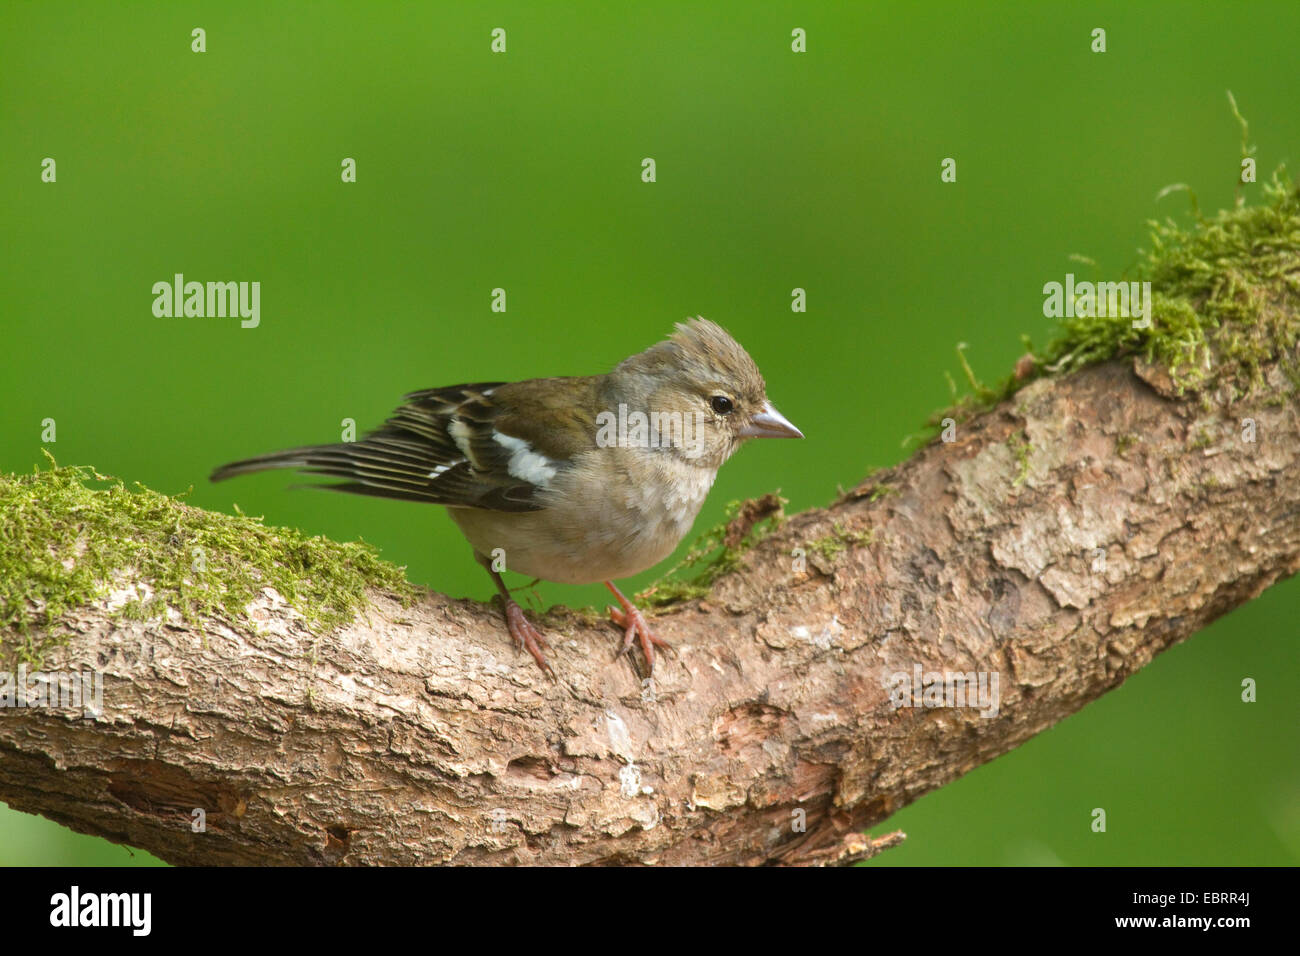 chaffinch (Fringilla coelebs), female on a branch, Germany, North Rhine-Westphalia - Stock Image